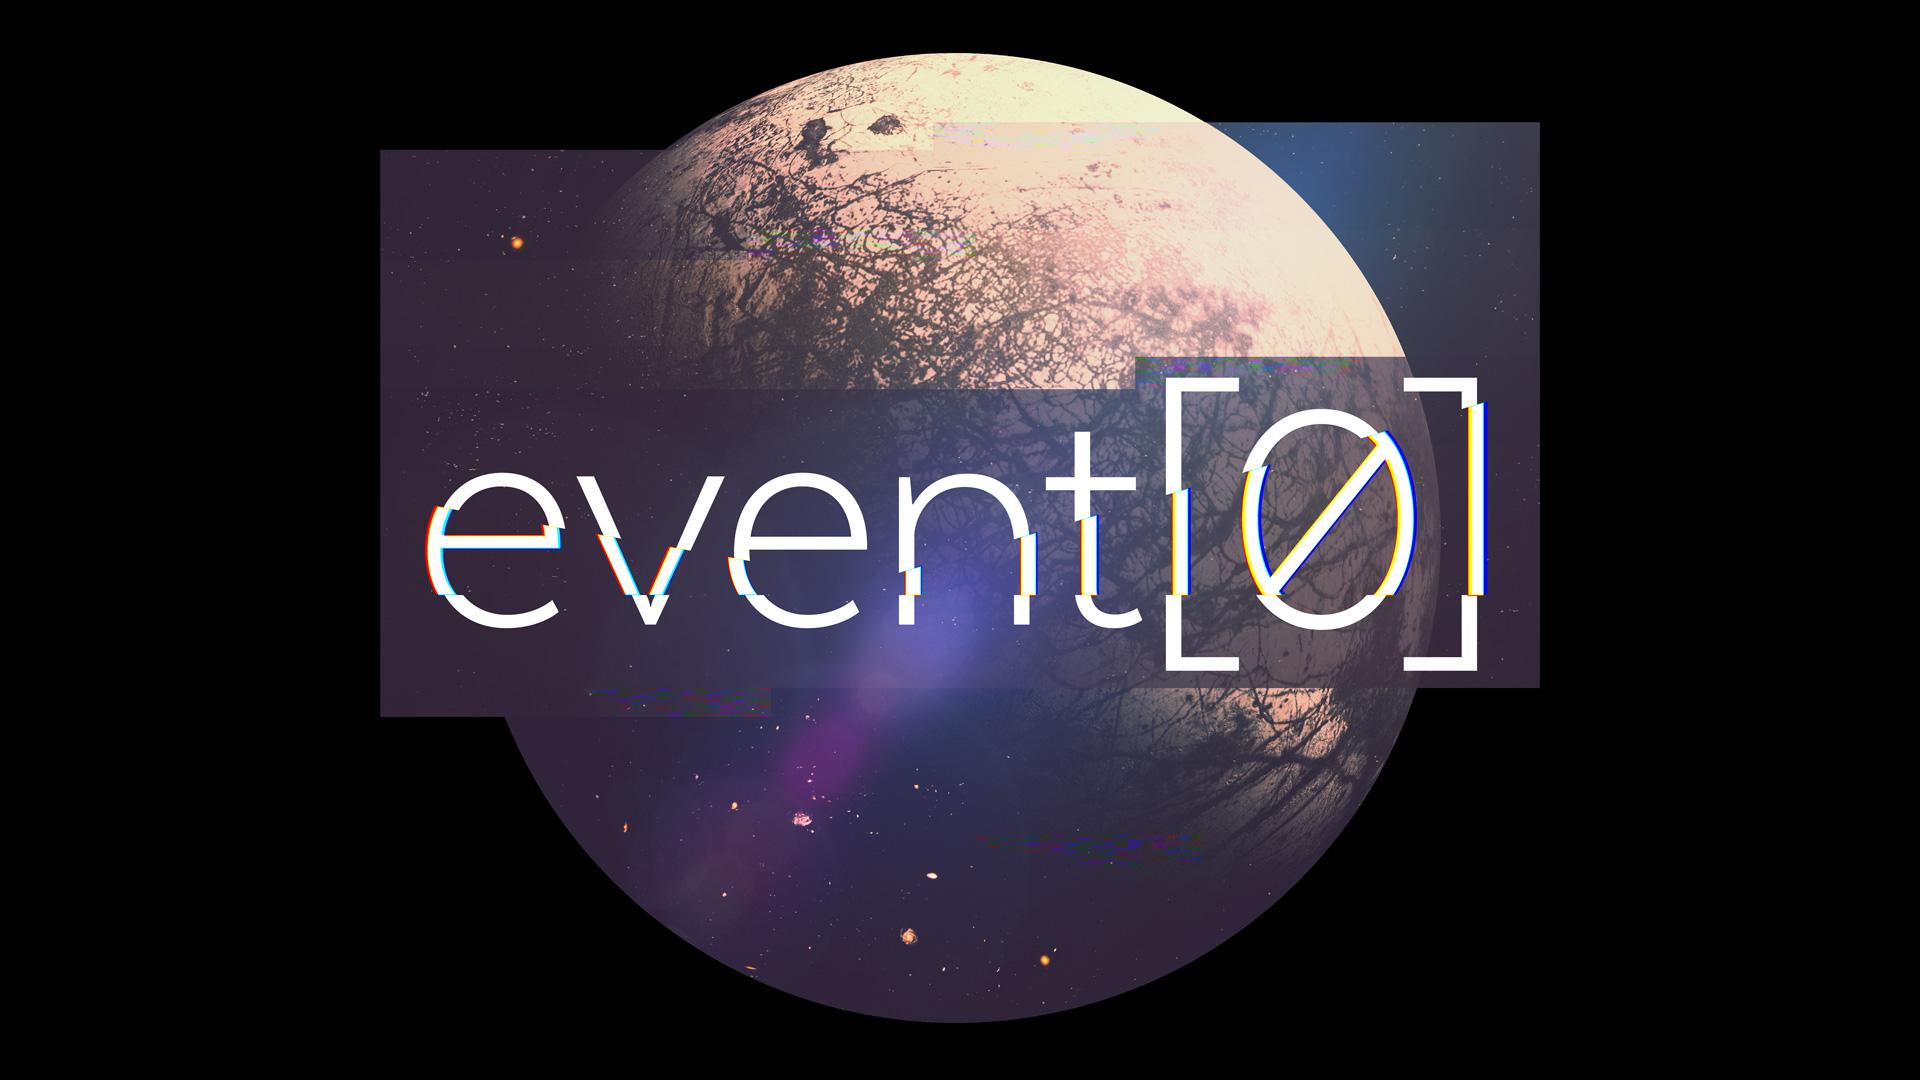 event0-promo-art-01